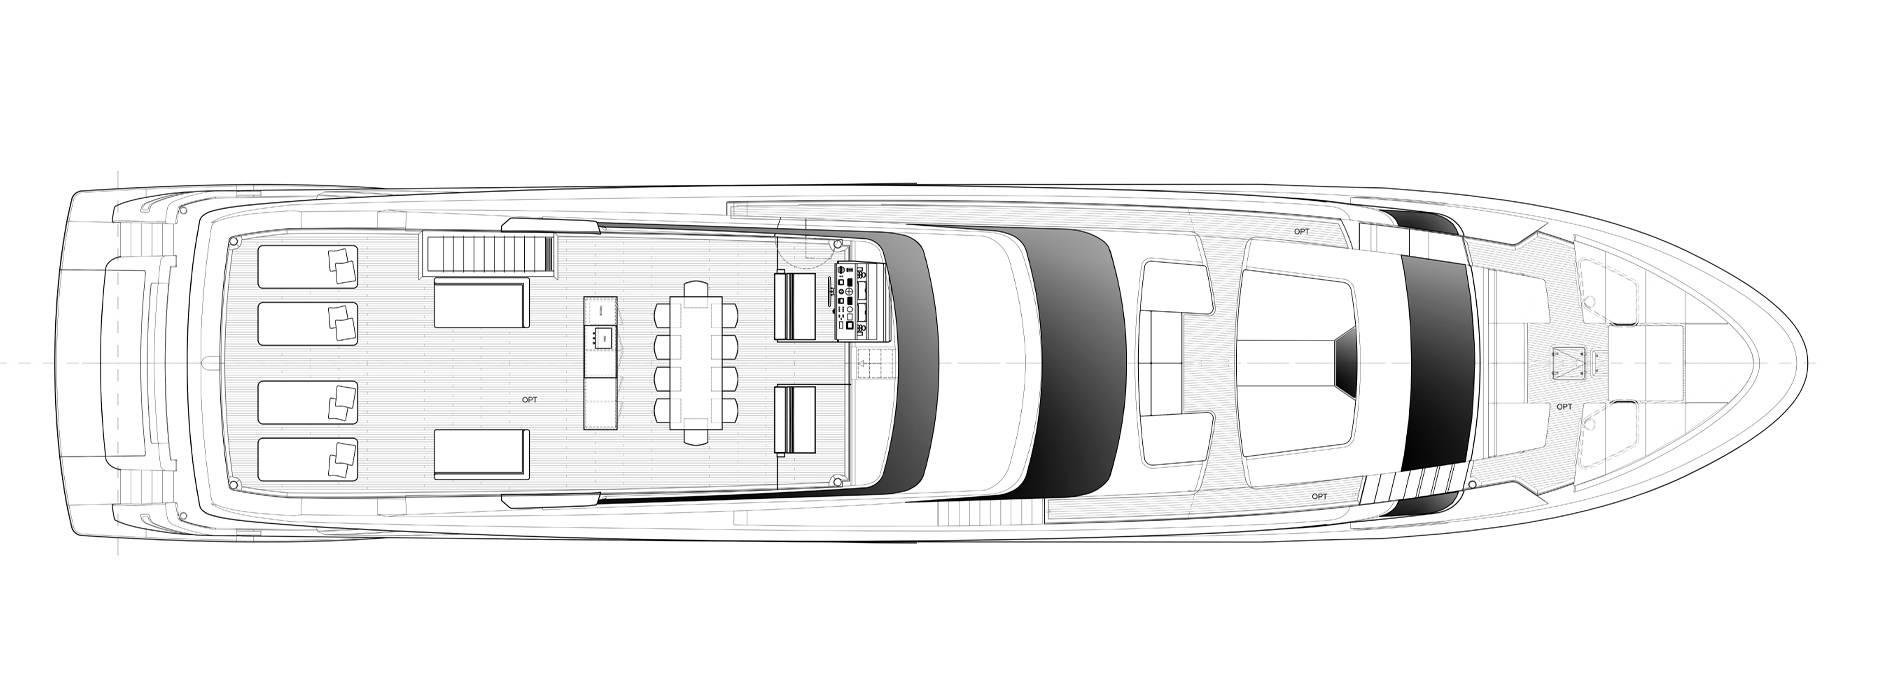 Sanlorenzo Yachts SL120 Asymmetric Флайбридж